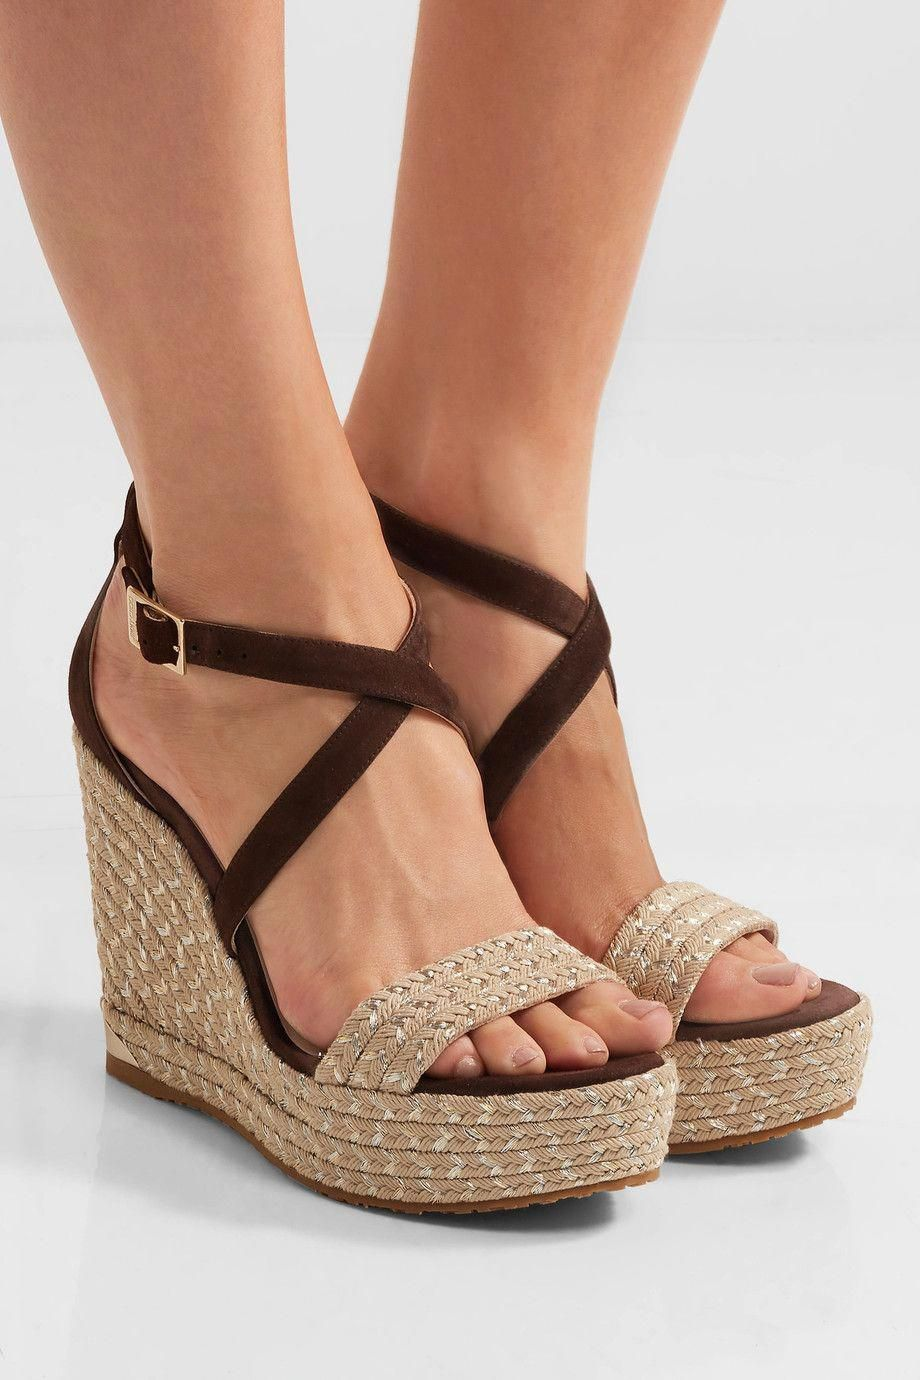 Jimmy Choo Portia suede wedge sandals #JimmyChoo | Trending